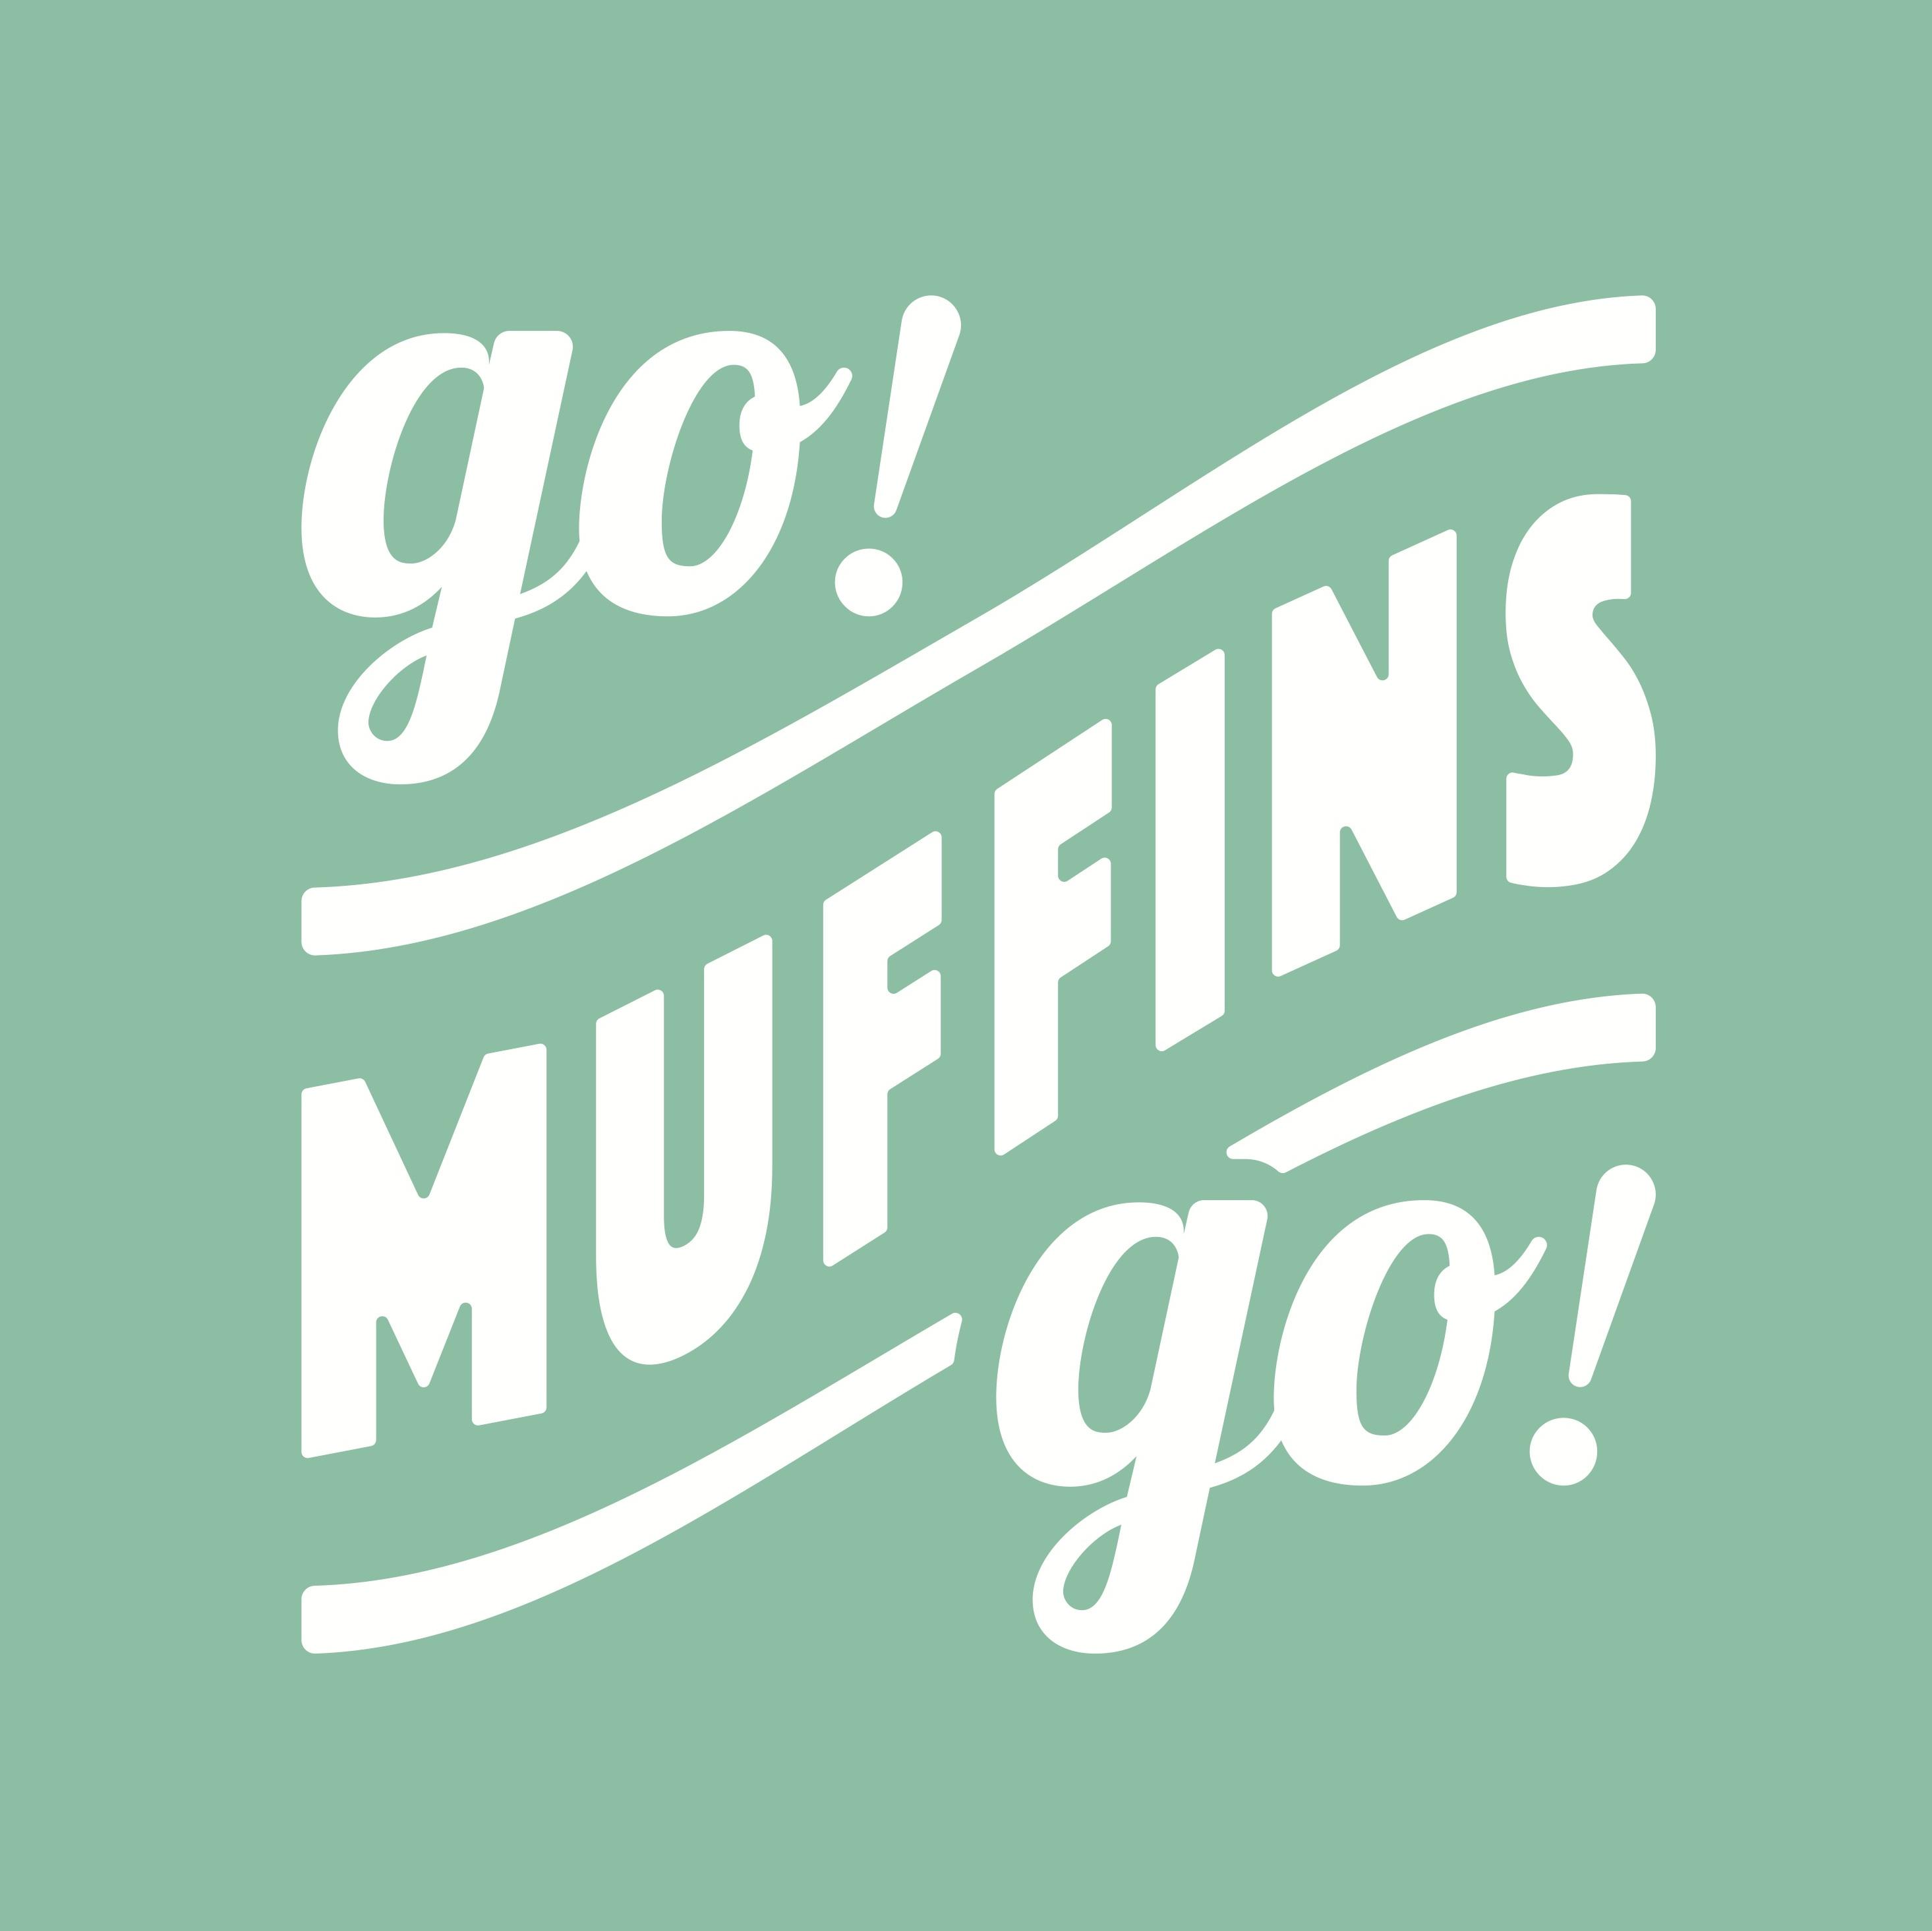 go! mufffins go!